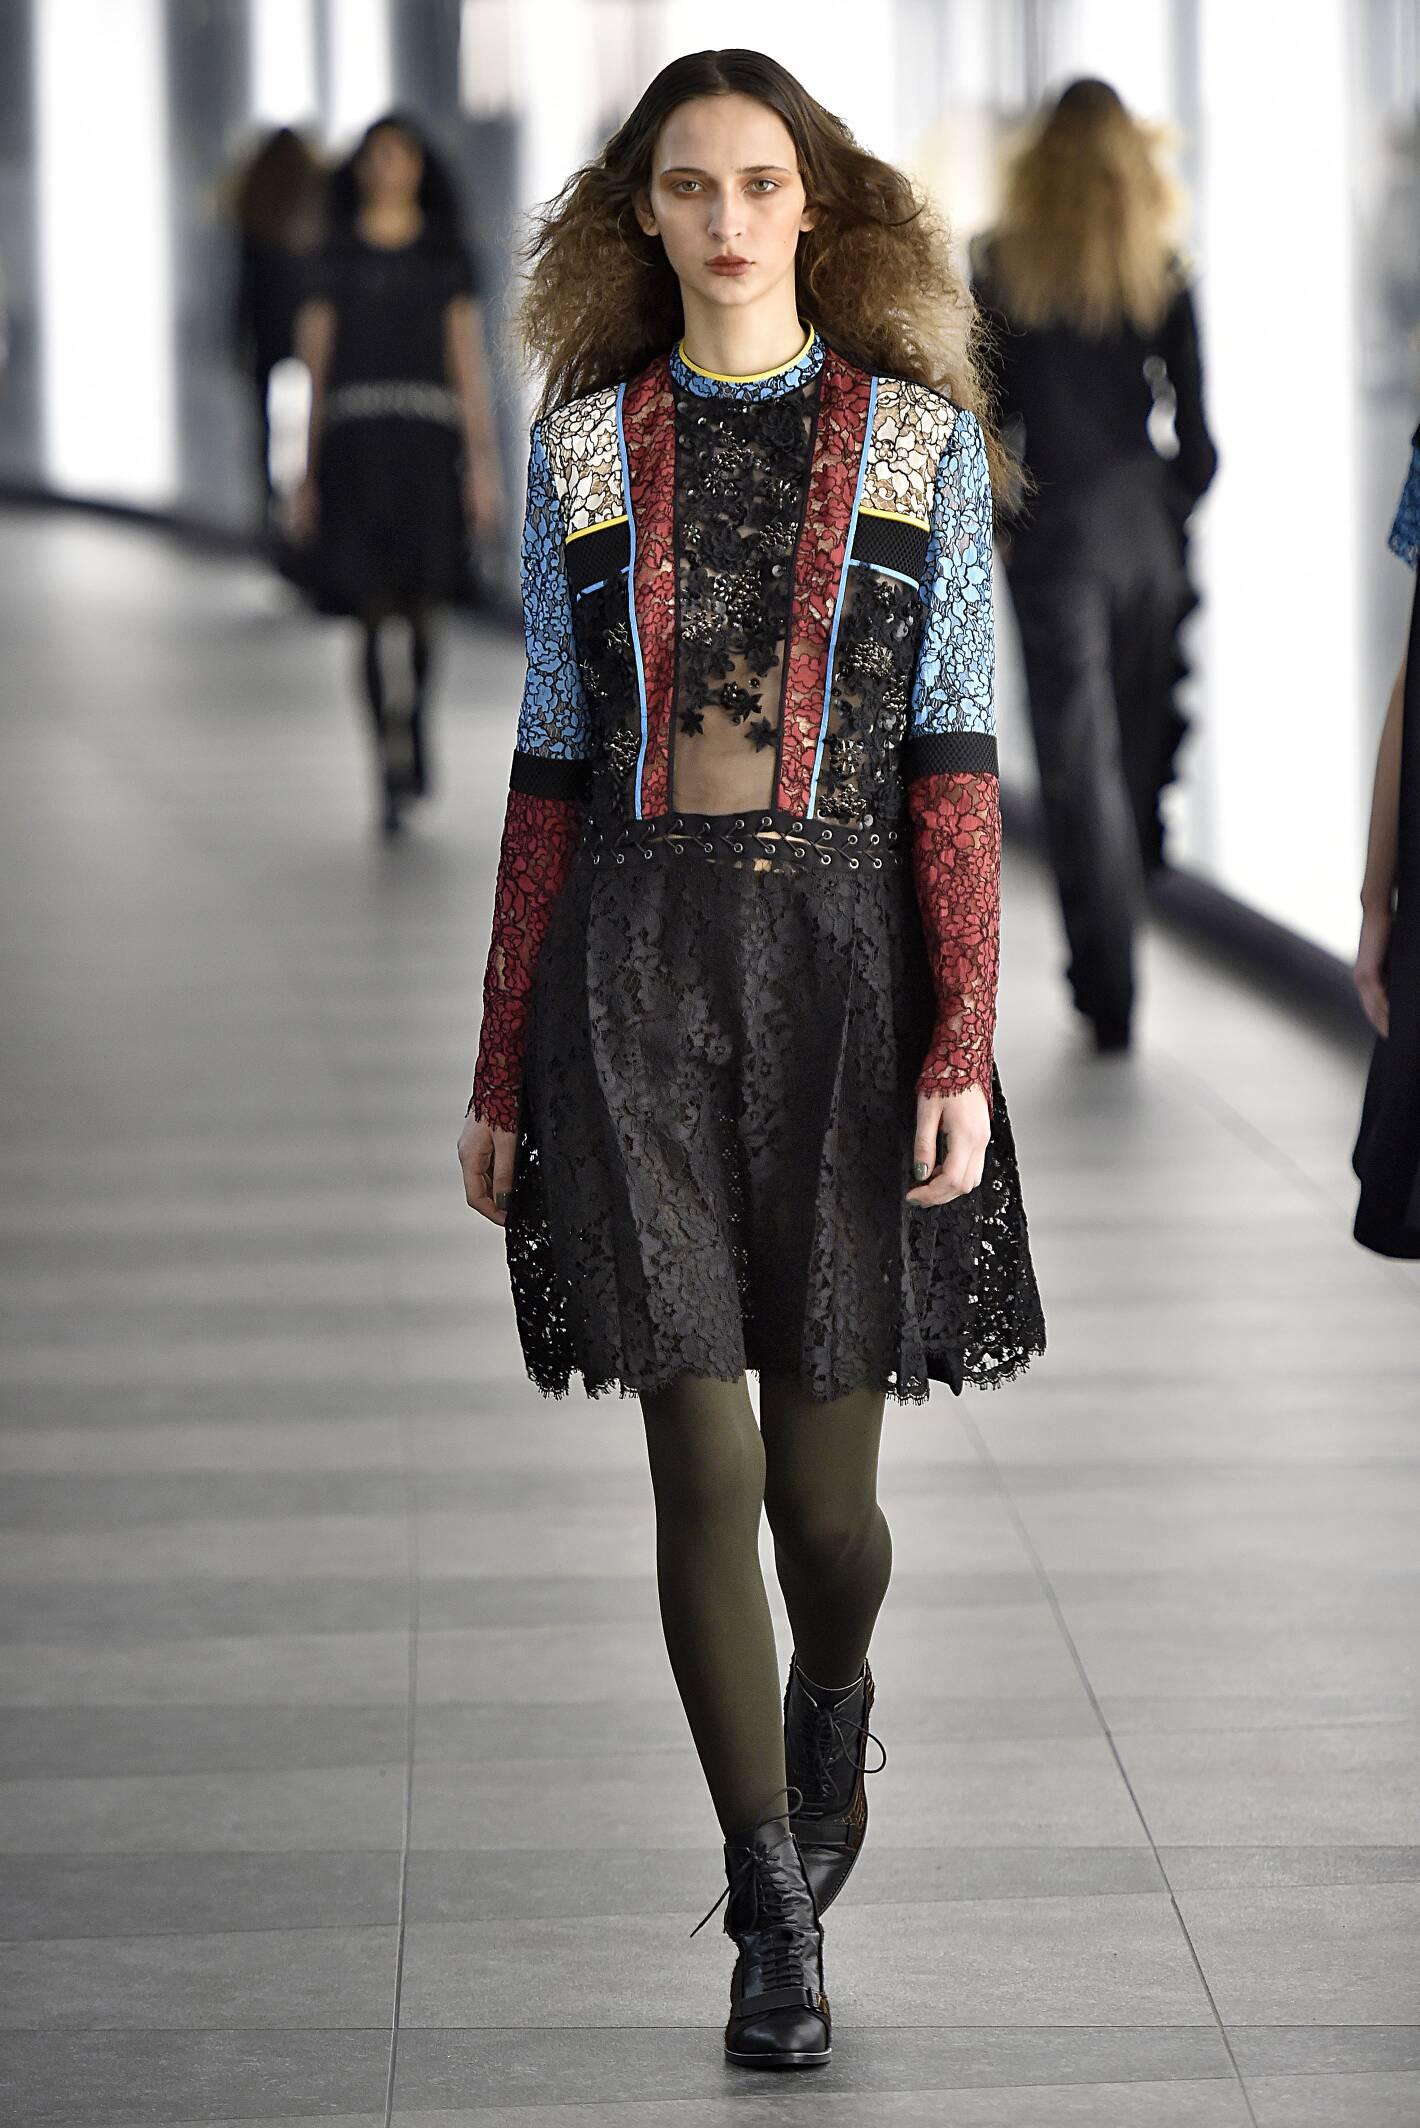 Preen by Thornton Bregazzi Fall Winter 2015 16 Womens Collection London Fashion Week